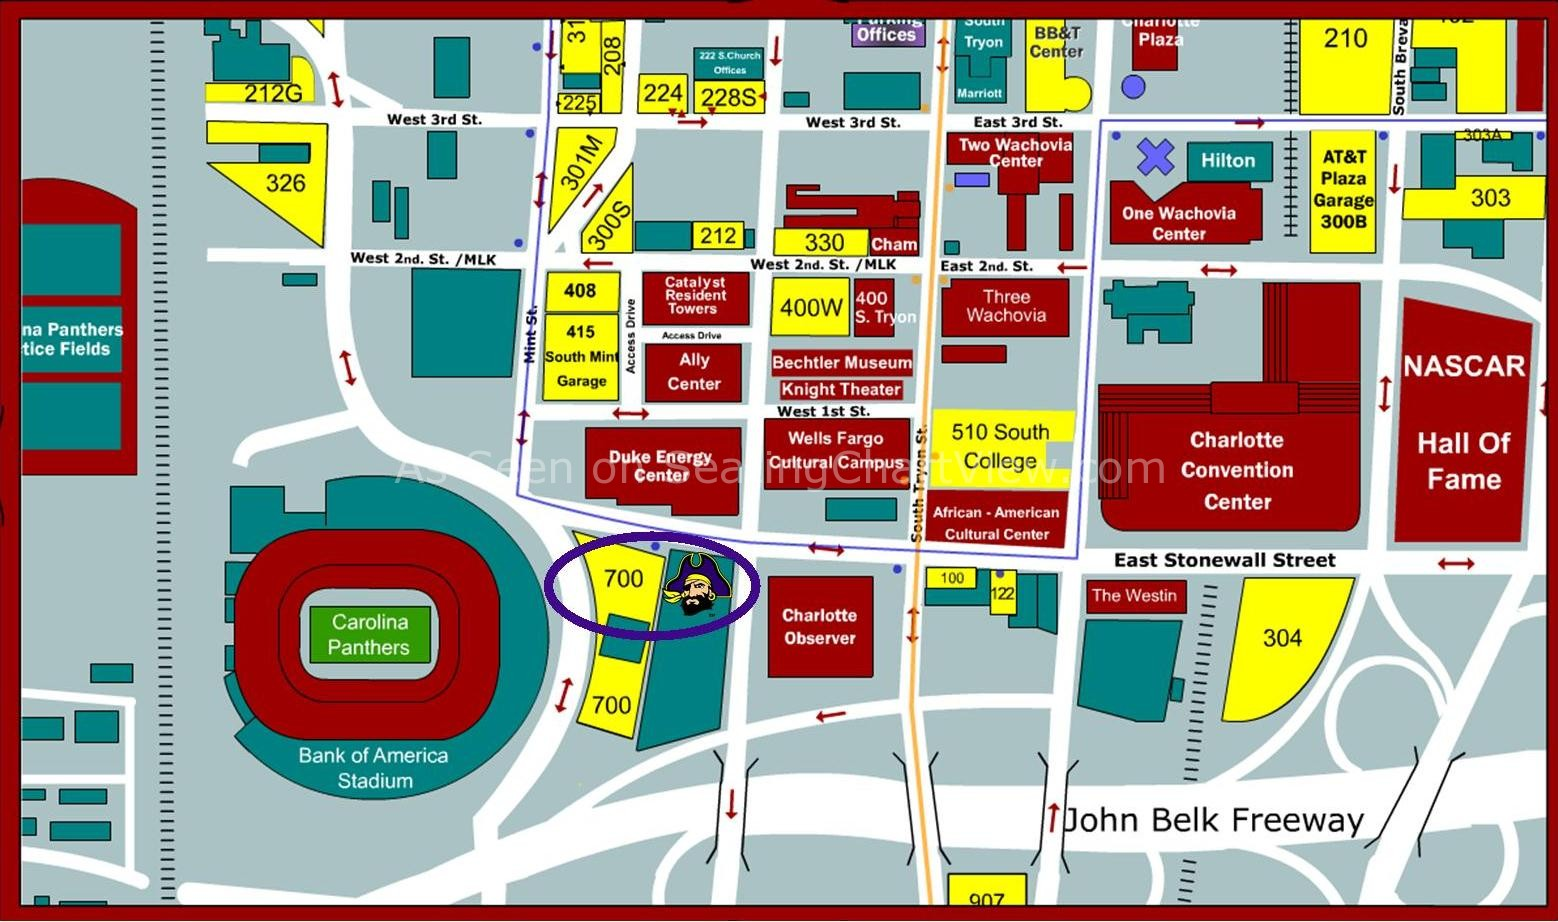 Bank Of America Stadium Map Bank of America Stadium, Charlotte NC | Seating Chart View Bank Of America Stadium Map